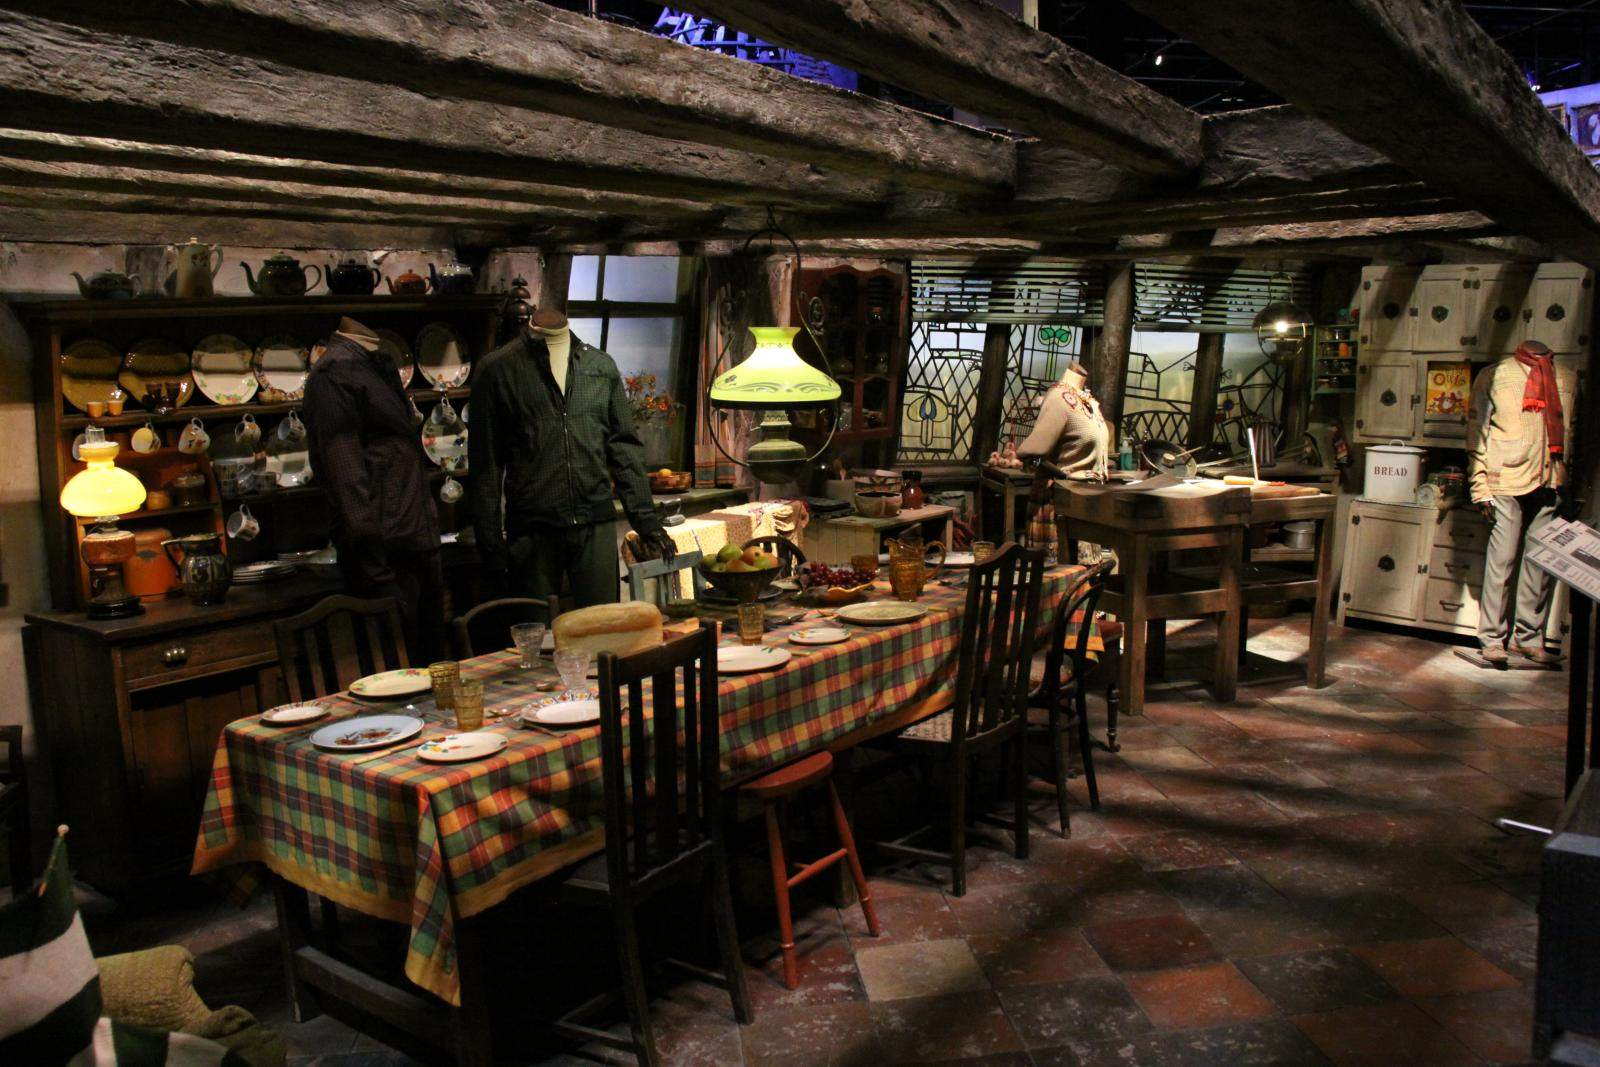 making harry potter14 The Making of Harry Potter, Warner Bros Studio London